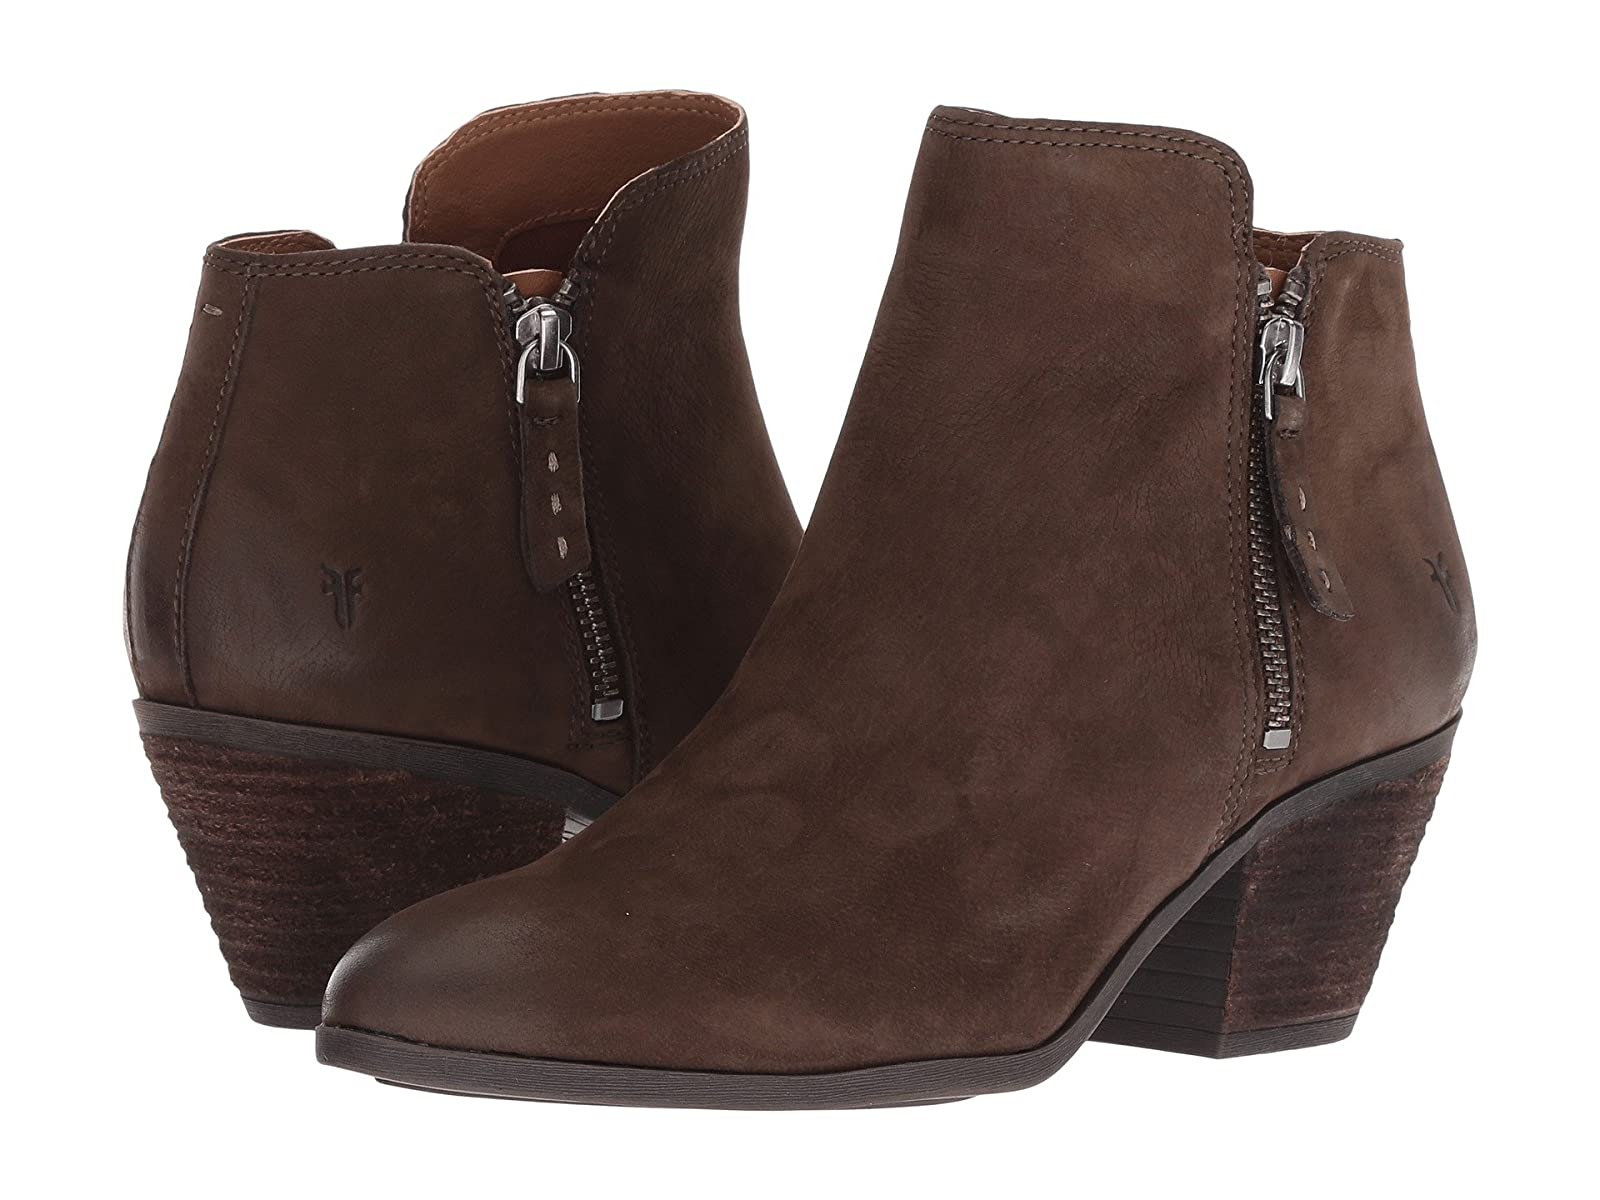 Frye Judy Zip BootieCheap and distinctive eye-catching shoes